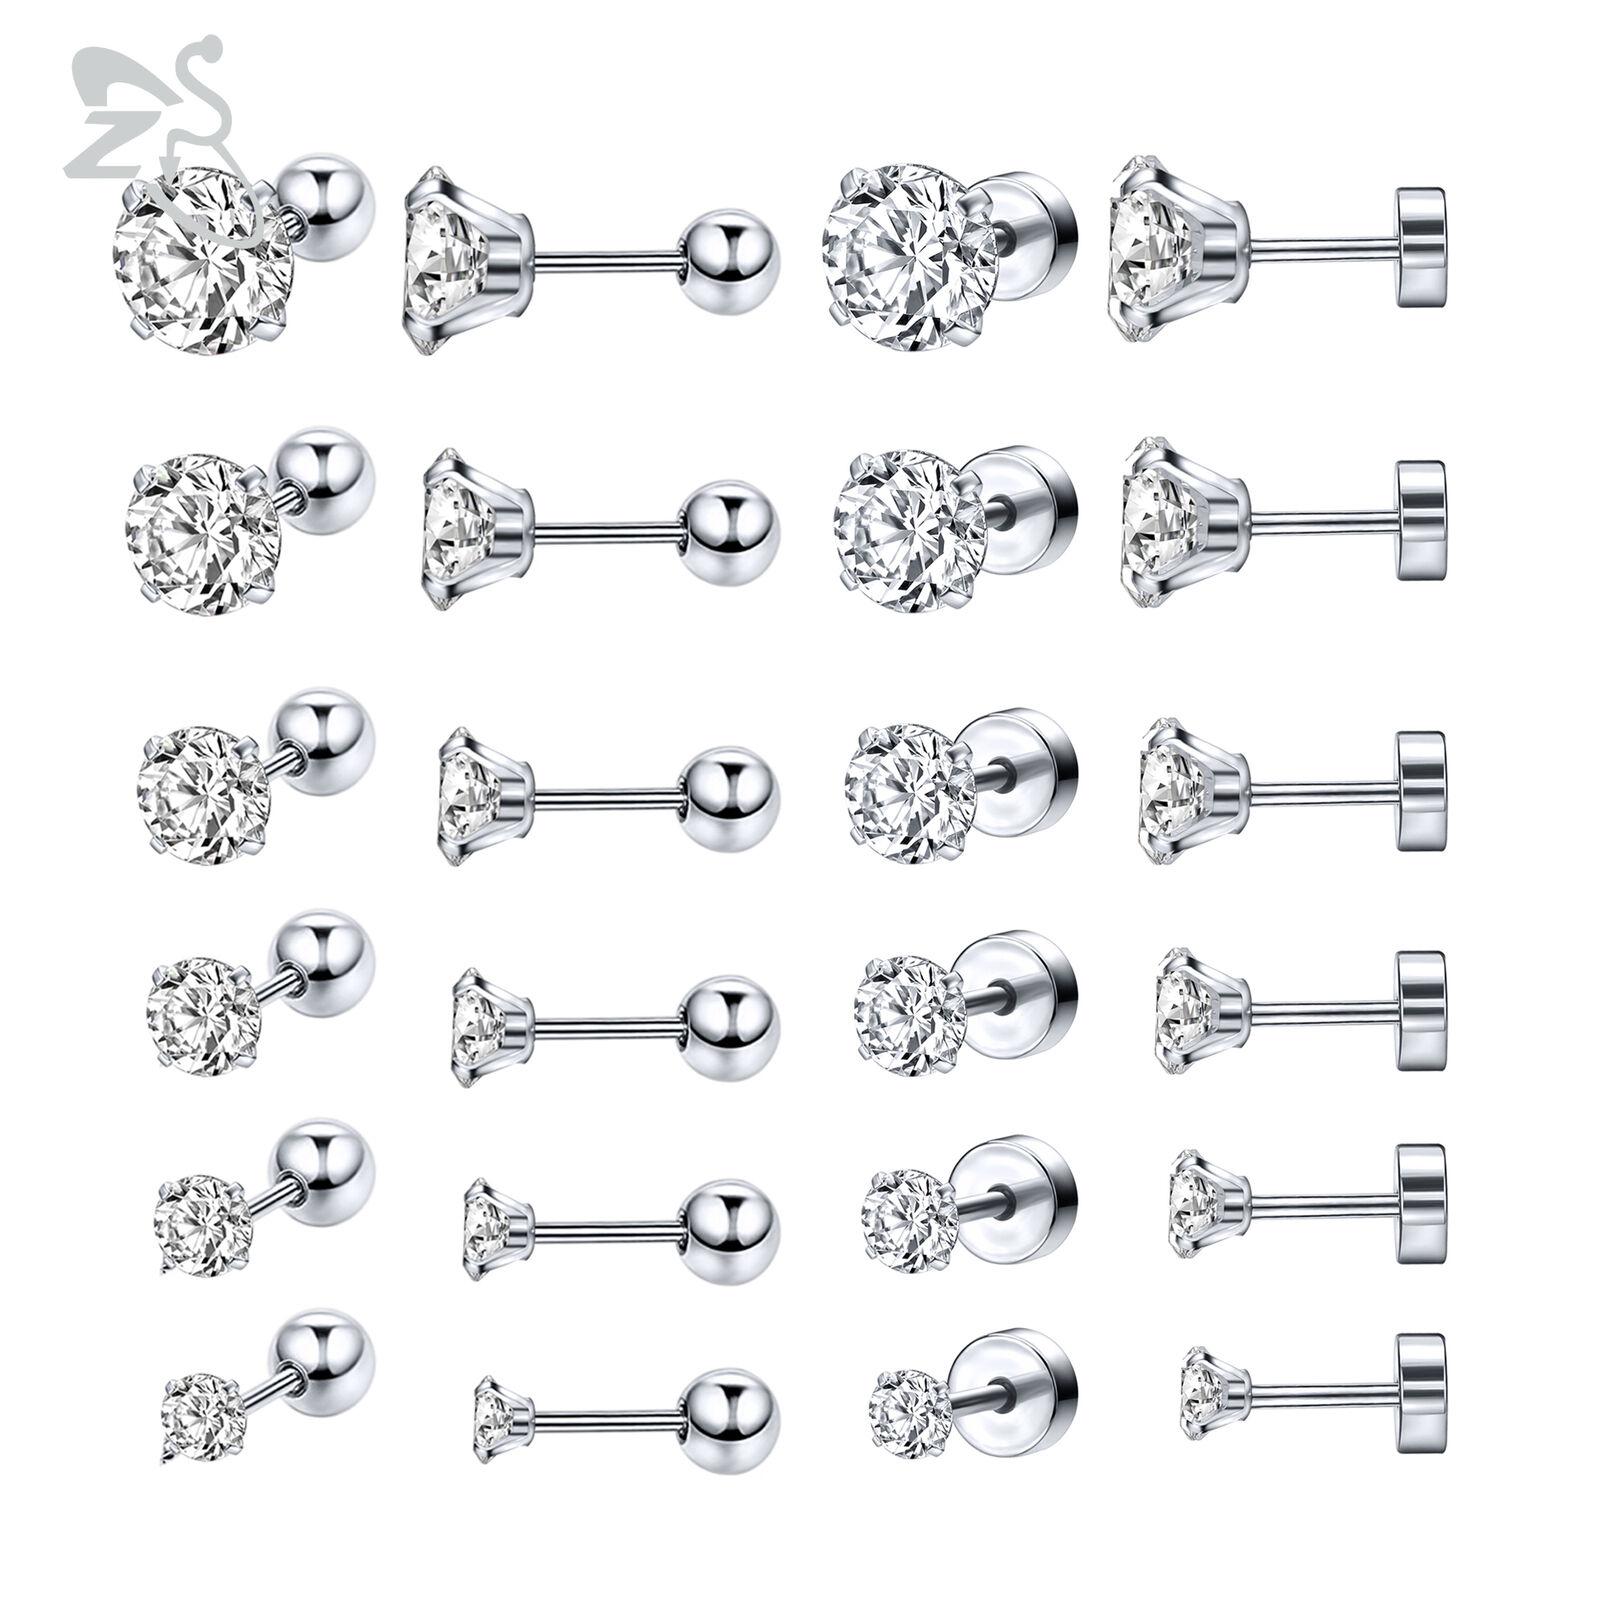 6 Pairs Stainless Steel Stud Earrings CZ Crystal Helix Carti